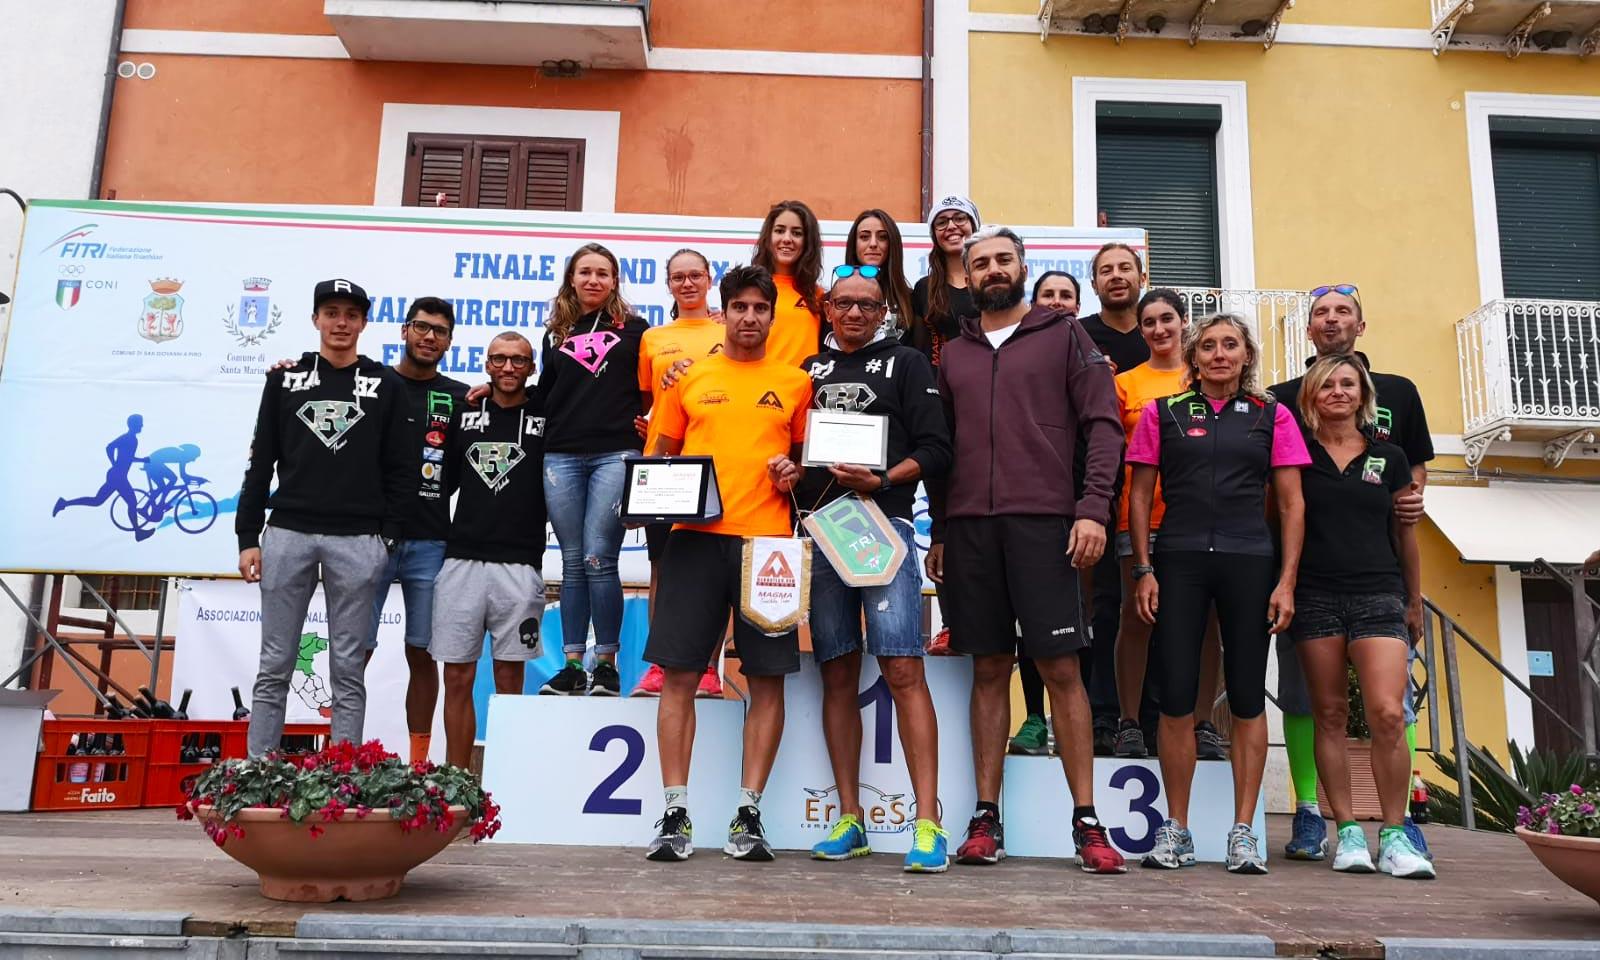 triathlon-pavese-raschiani-pavia-cycling-running-65